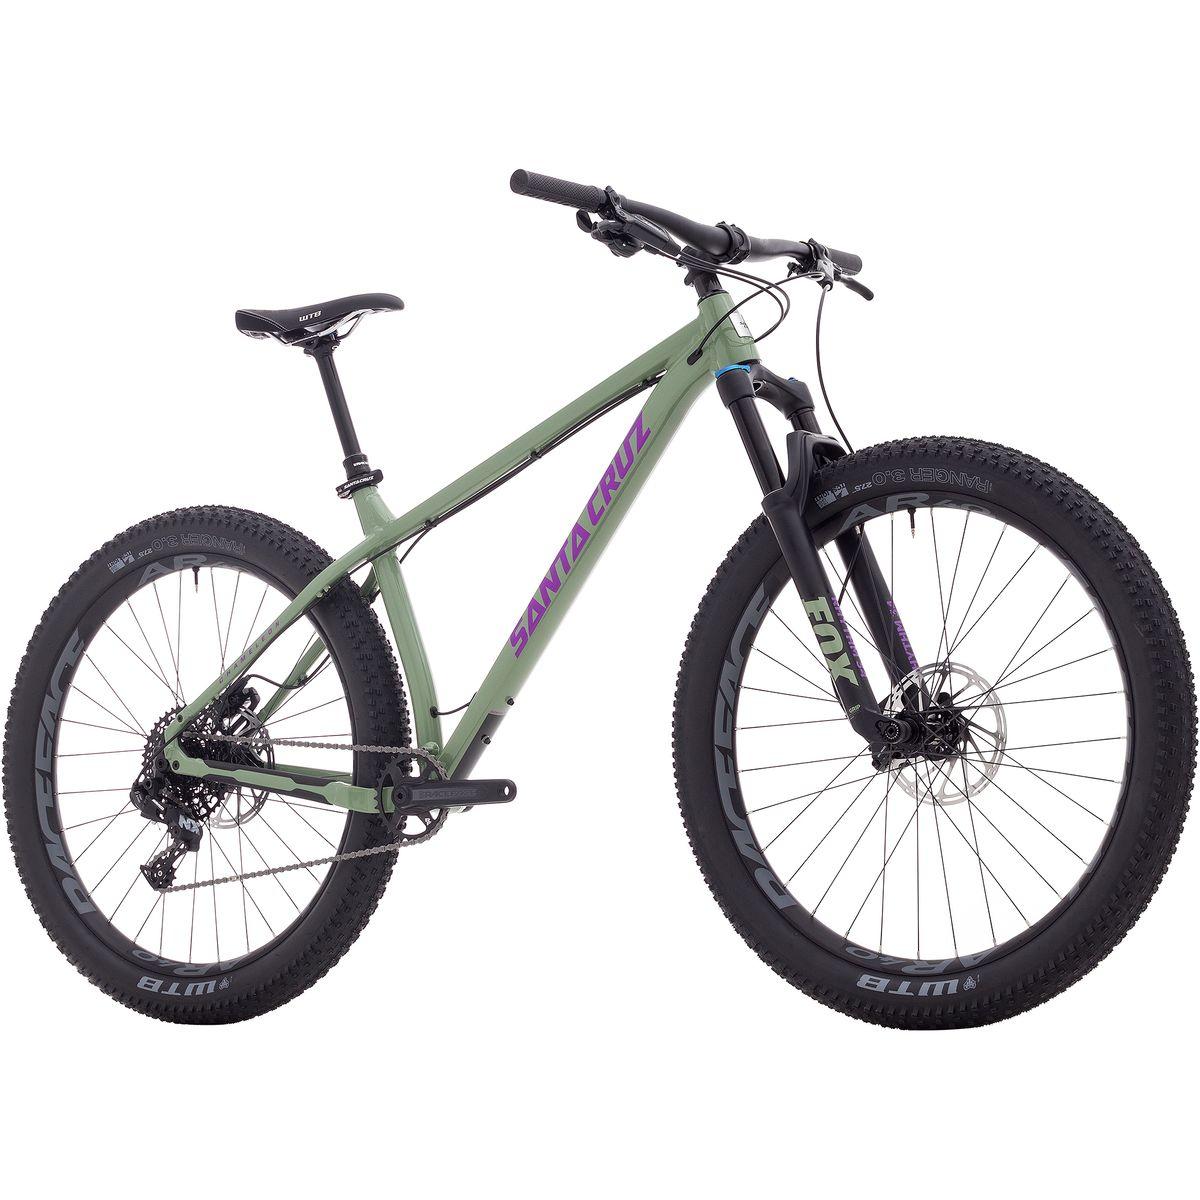 Santa Cruz Bicycles Chameleon 27.5 R Complete 2018